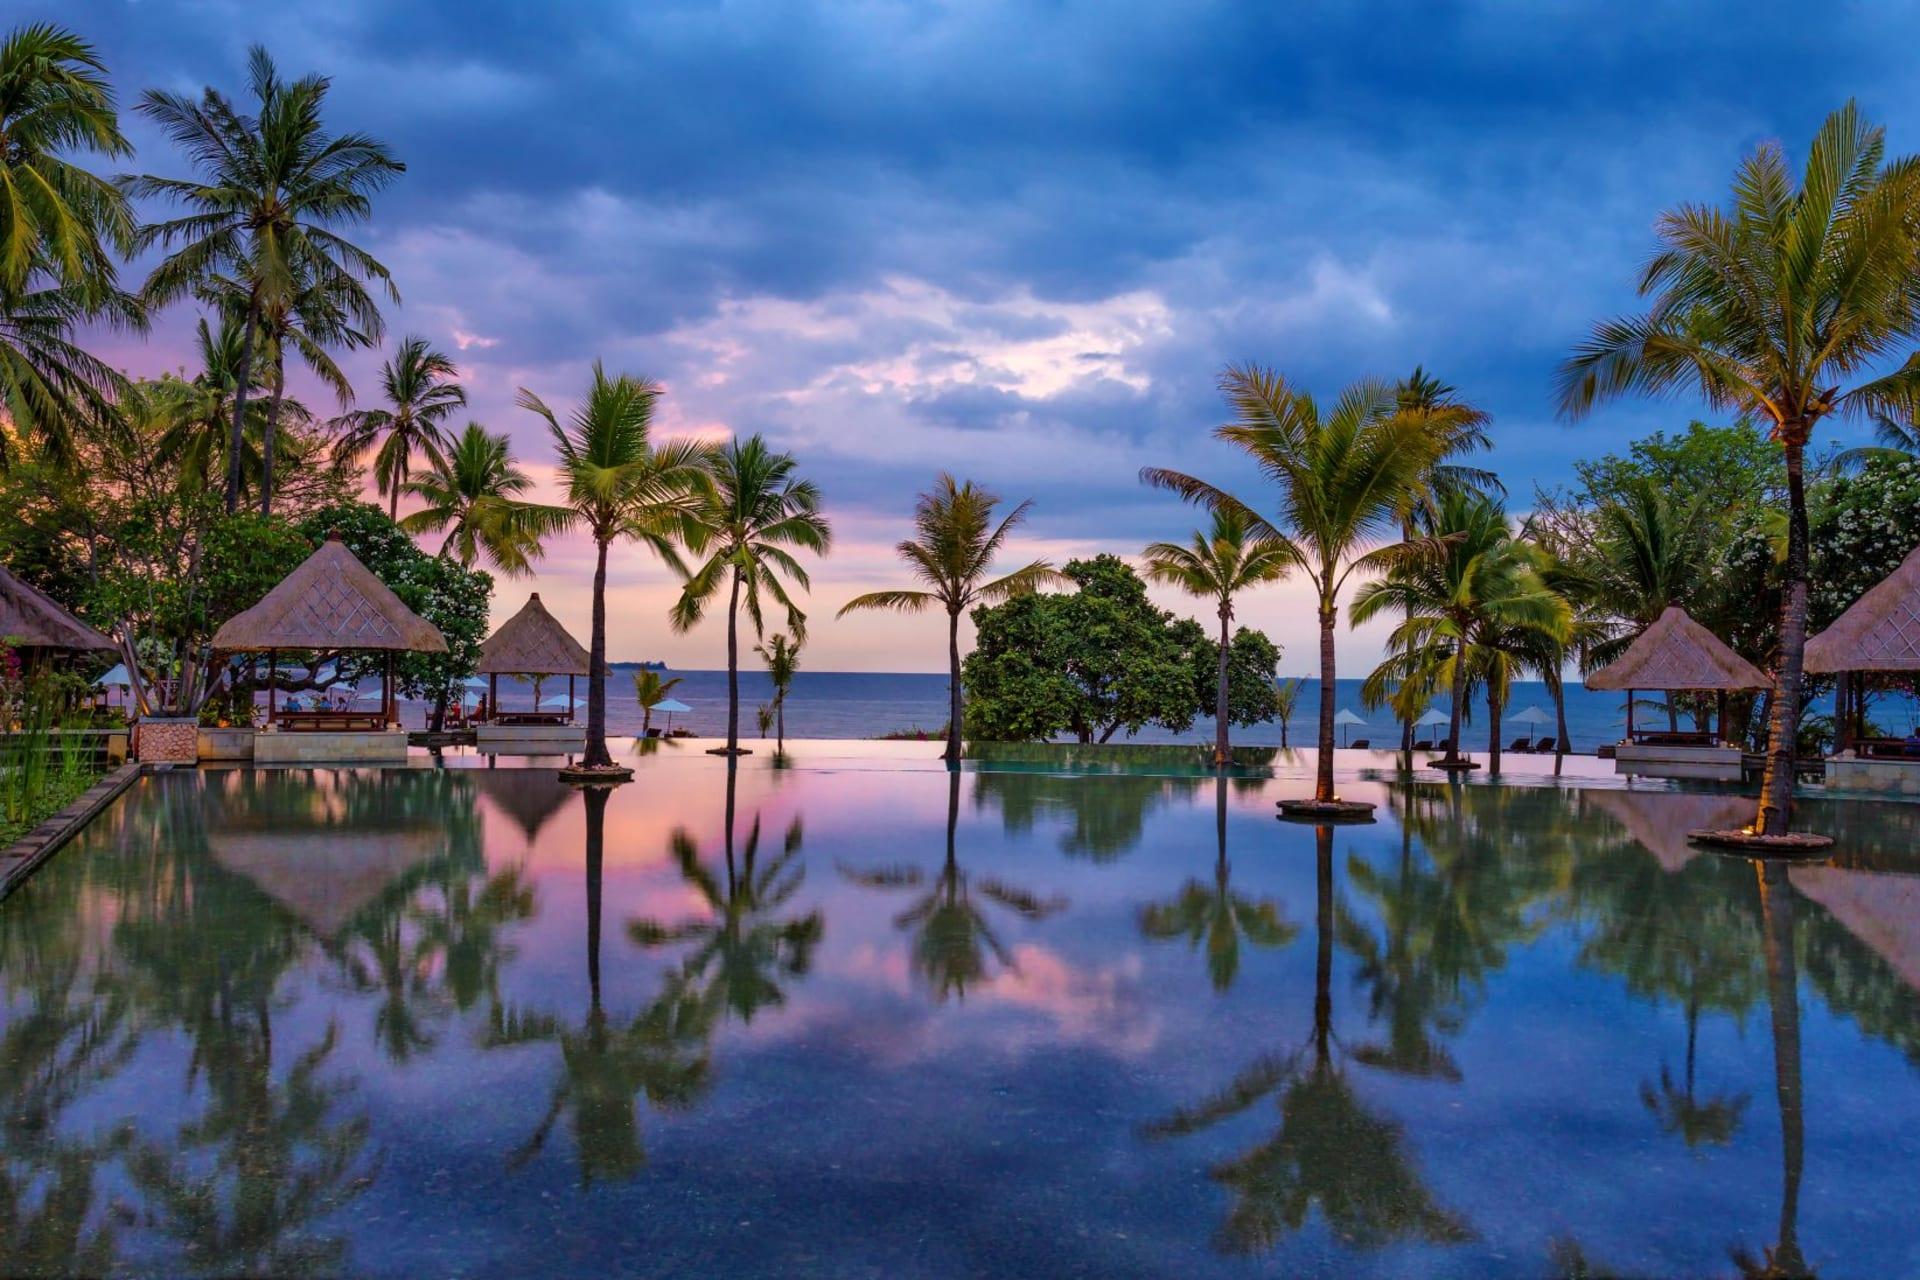 pool: Infinity pool sunset